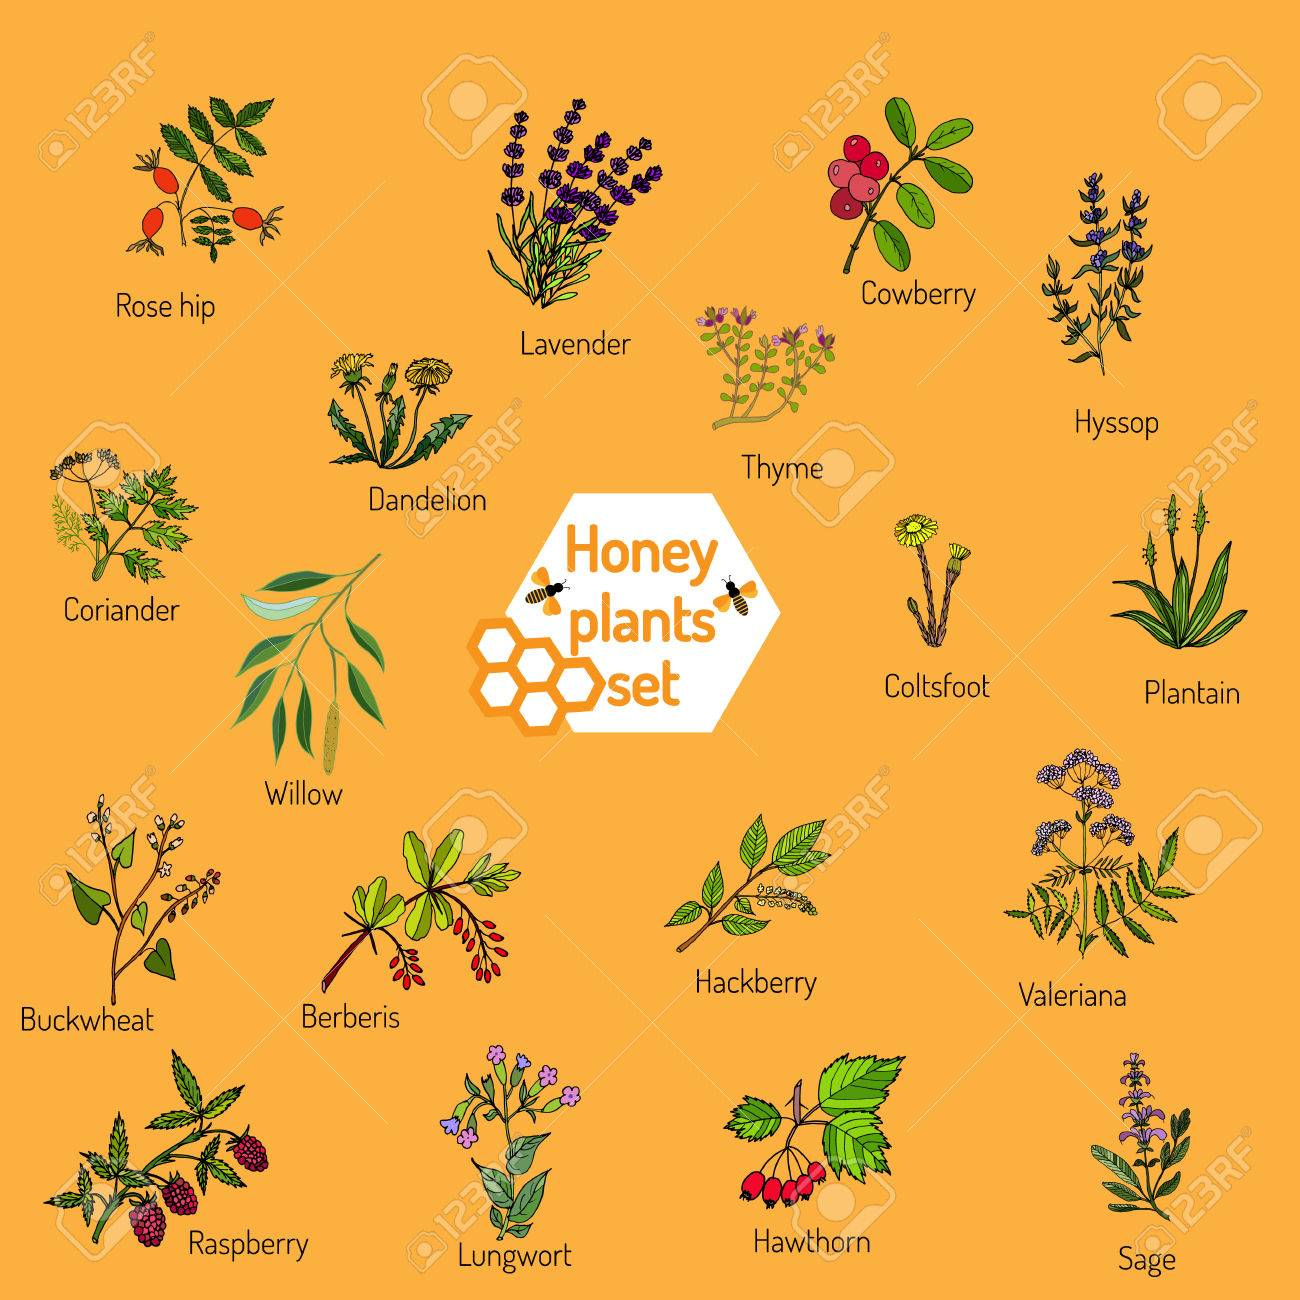 Image source plantsam com - Plants Nectar Sources For Honey Bees Vector Set Stock Vector 64081983